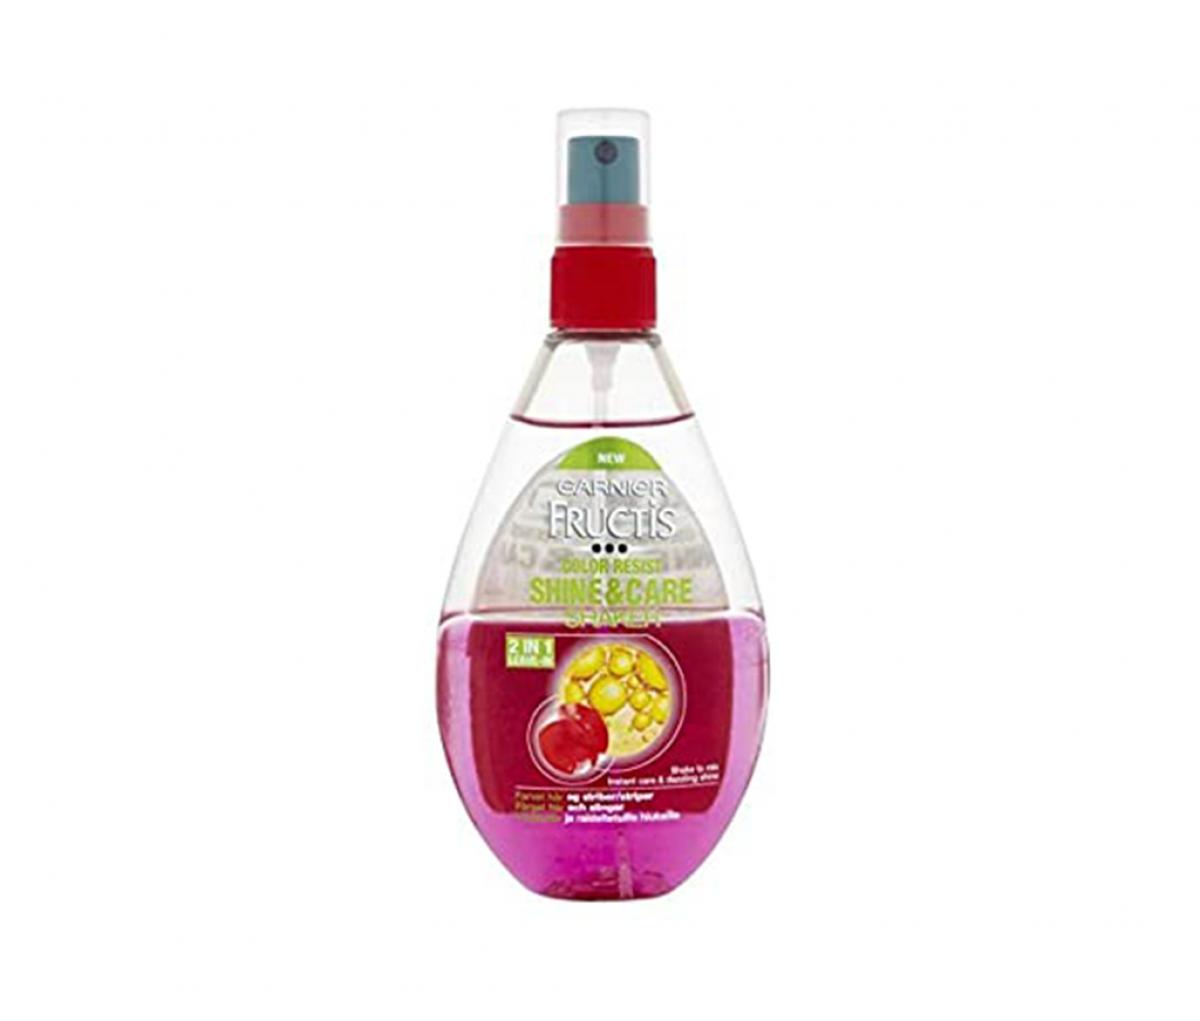 Garnier Fructis  2in1 Shine & Care Spray